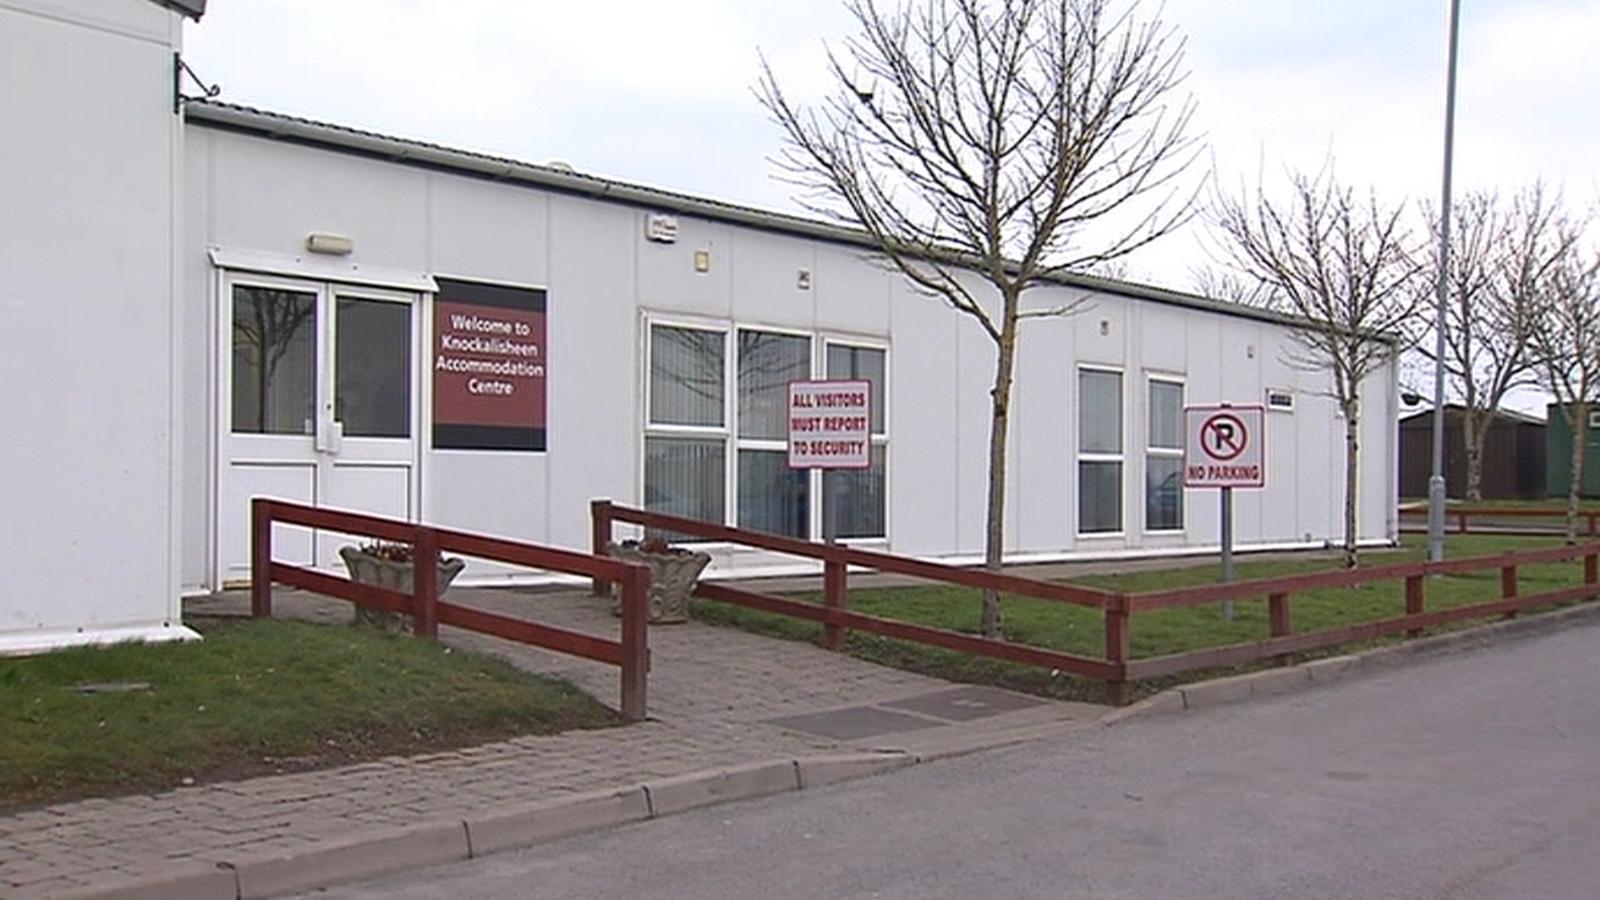 Image - Milltown Malbay direct provision centre